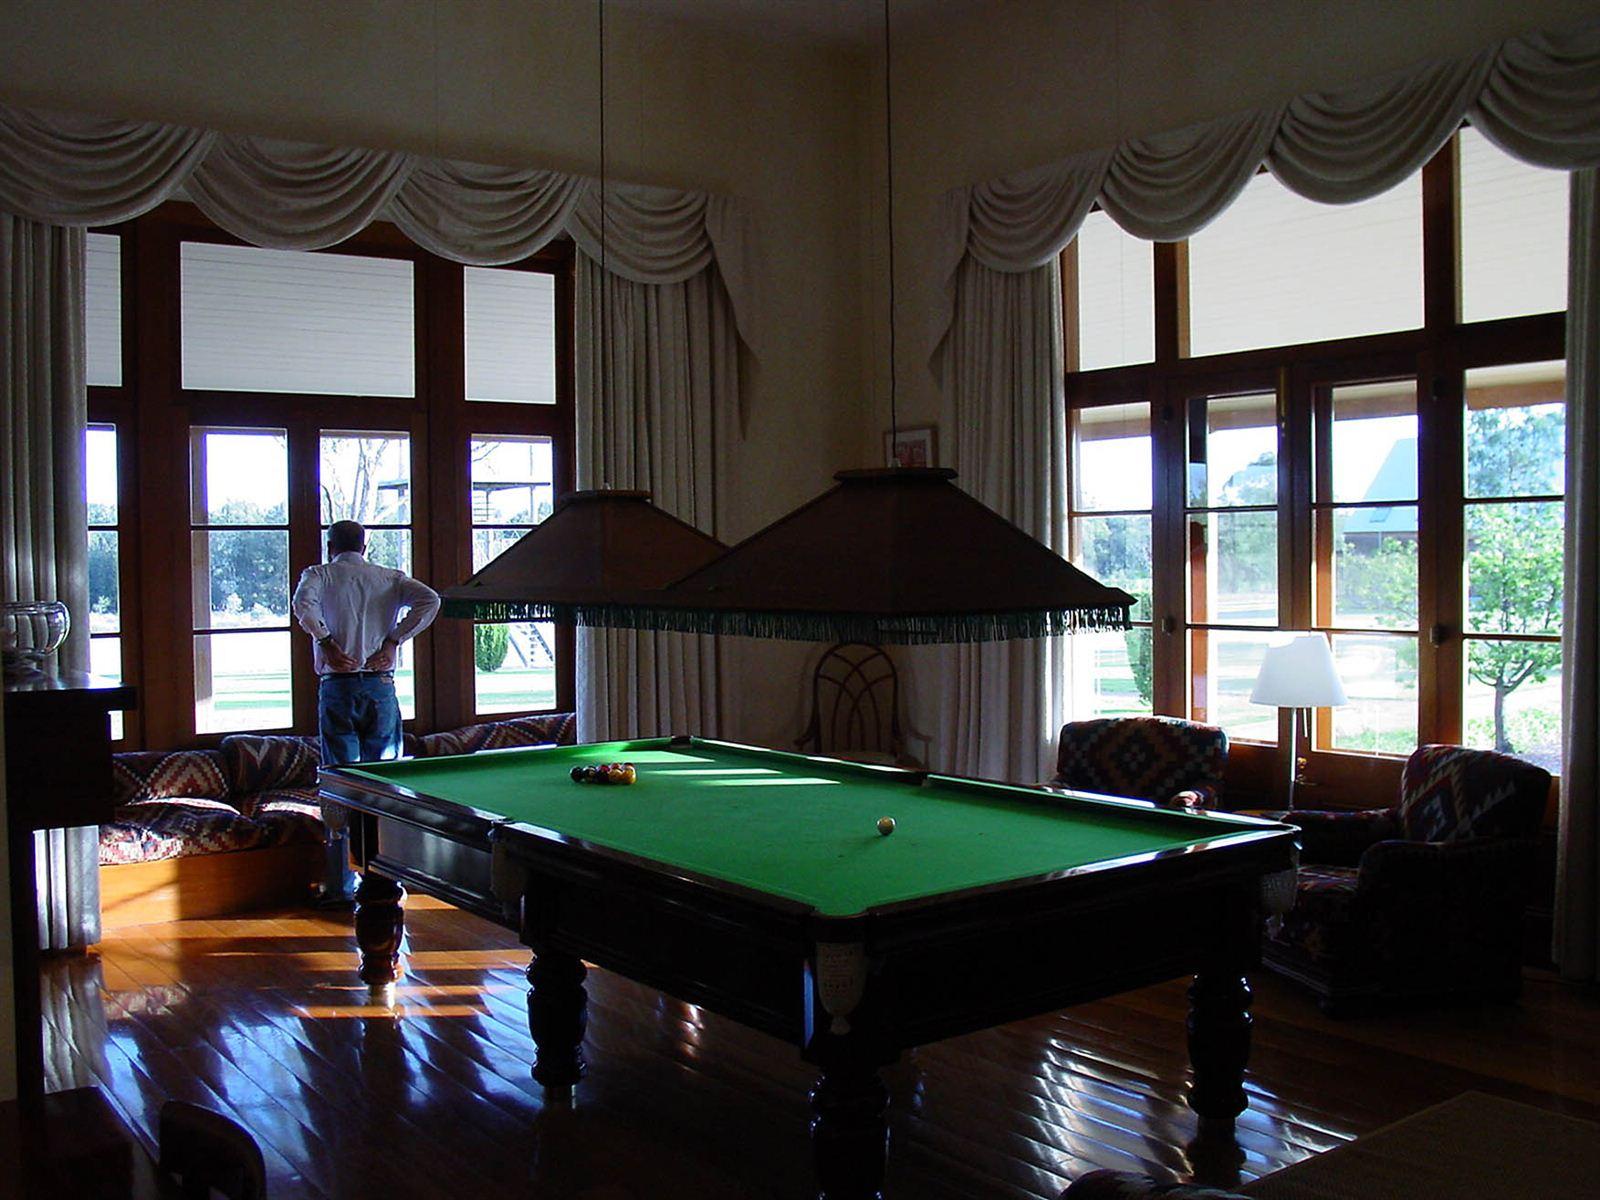 Billiards at the Homestead